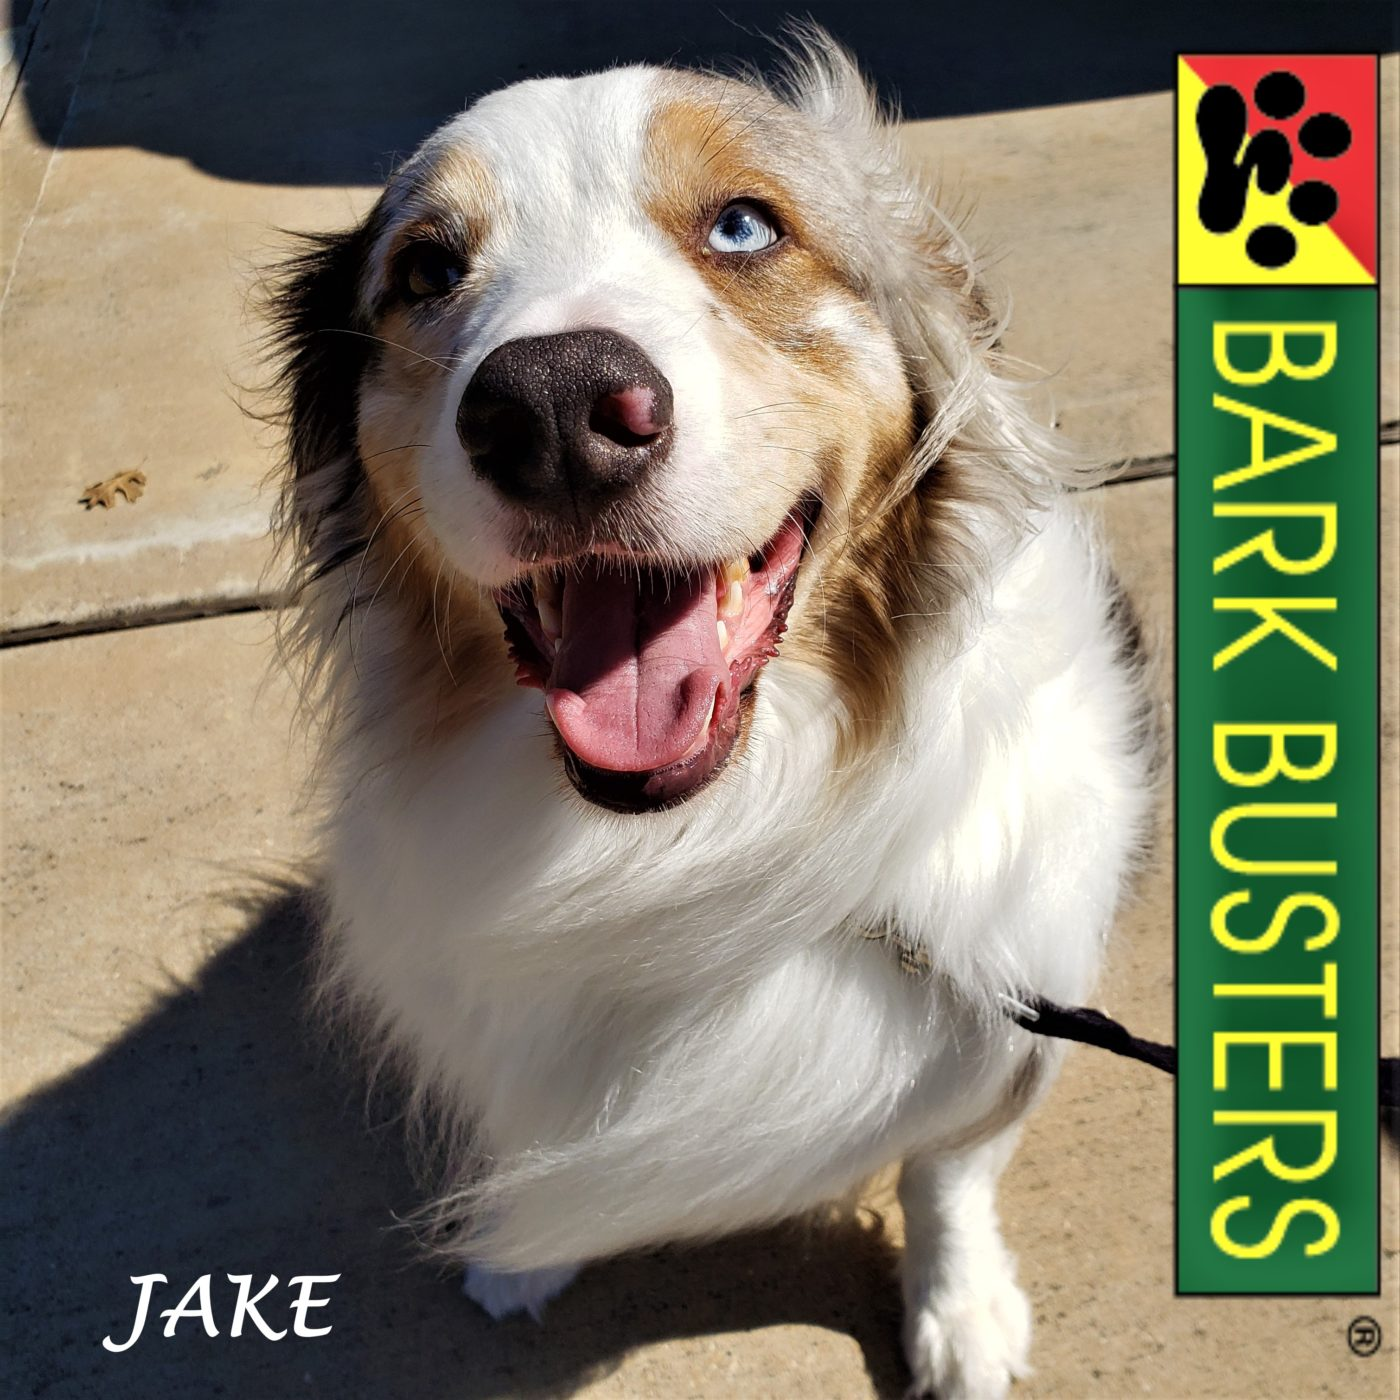 #australianshepherd #leashtraining #obediencetraining #speakdogchangeyourlife #dogtraininghutto #dogtrainernearme #barkbusters #inhomedogtraining